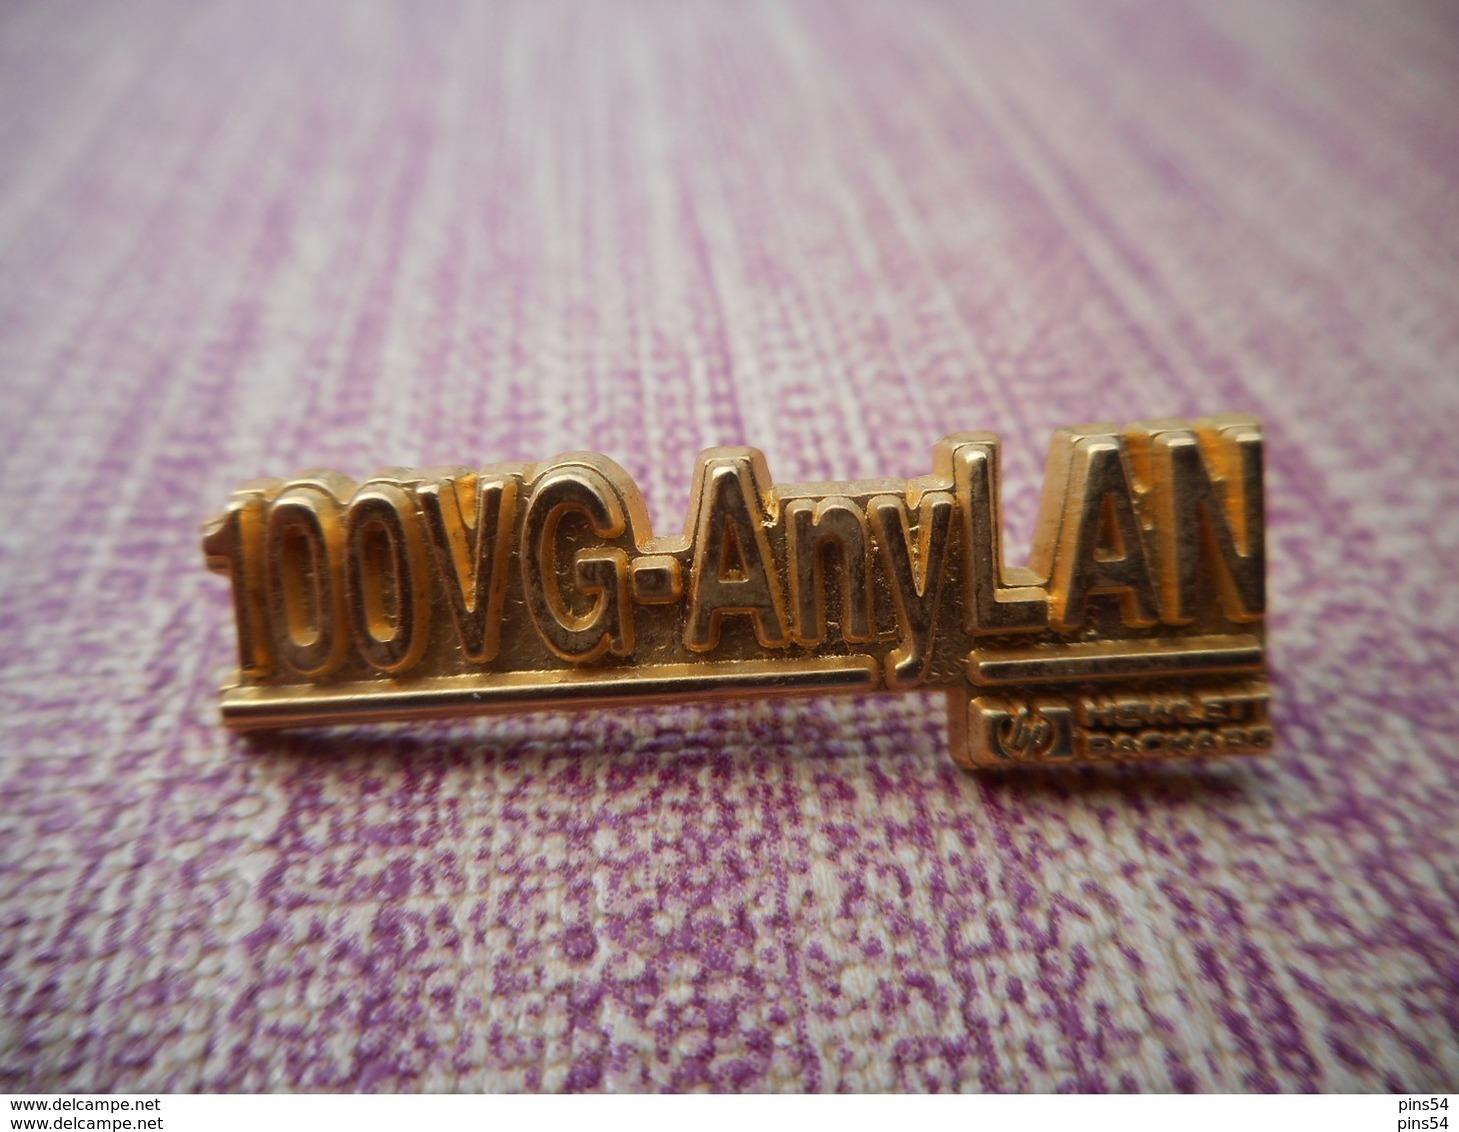 A006 -- Pin's Tosca -- 100VG-AnyLan -- Helwett Packard -- Exclusif Sur Delcampe - Informatique